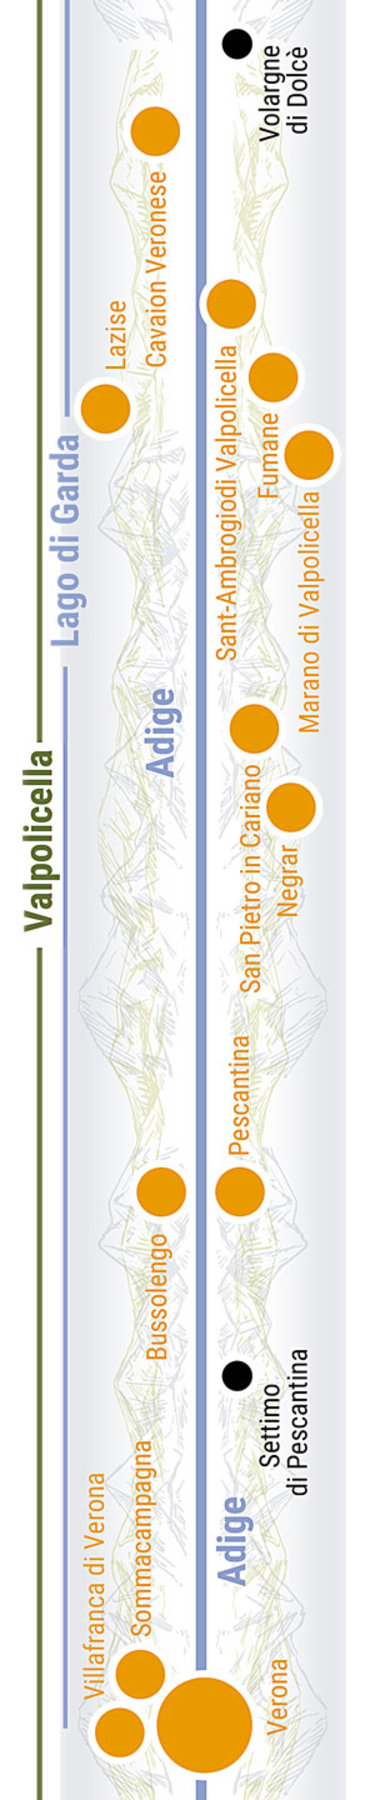 Übersichtskarte rechts Teilabschnitt 37p Valpolicella